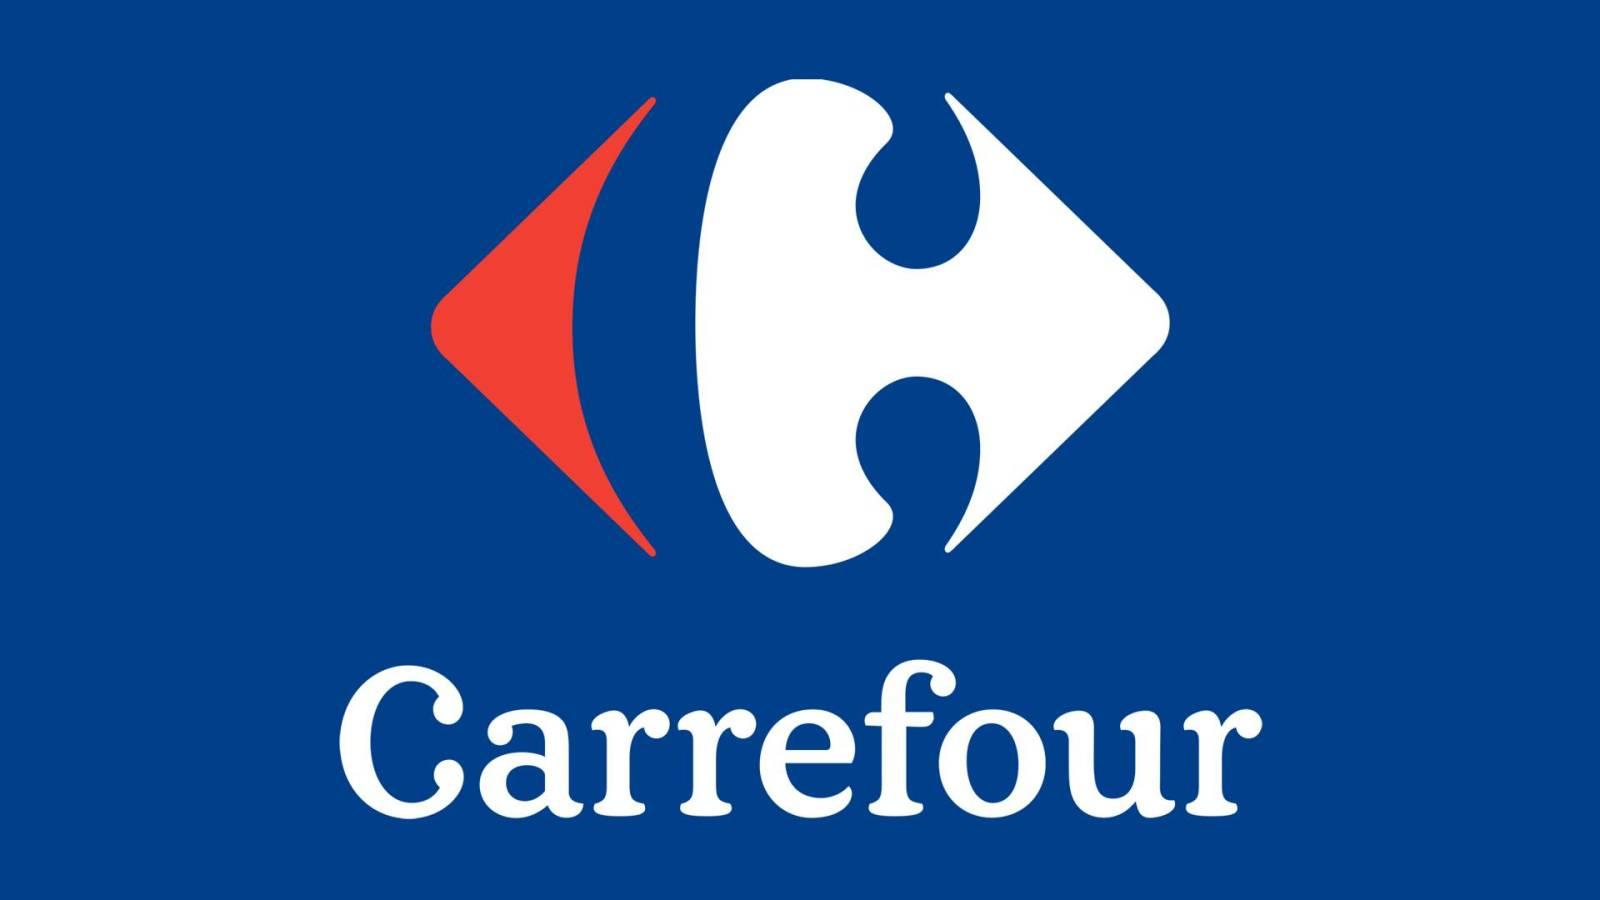 Carrefour imbunatatiri